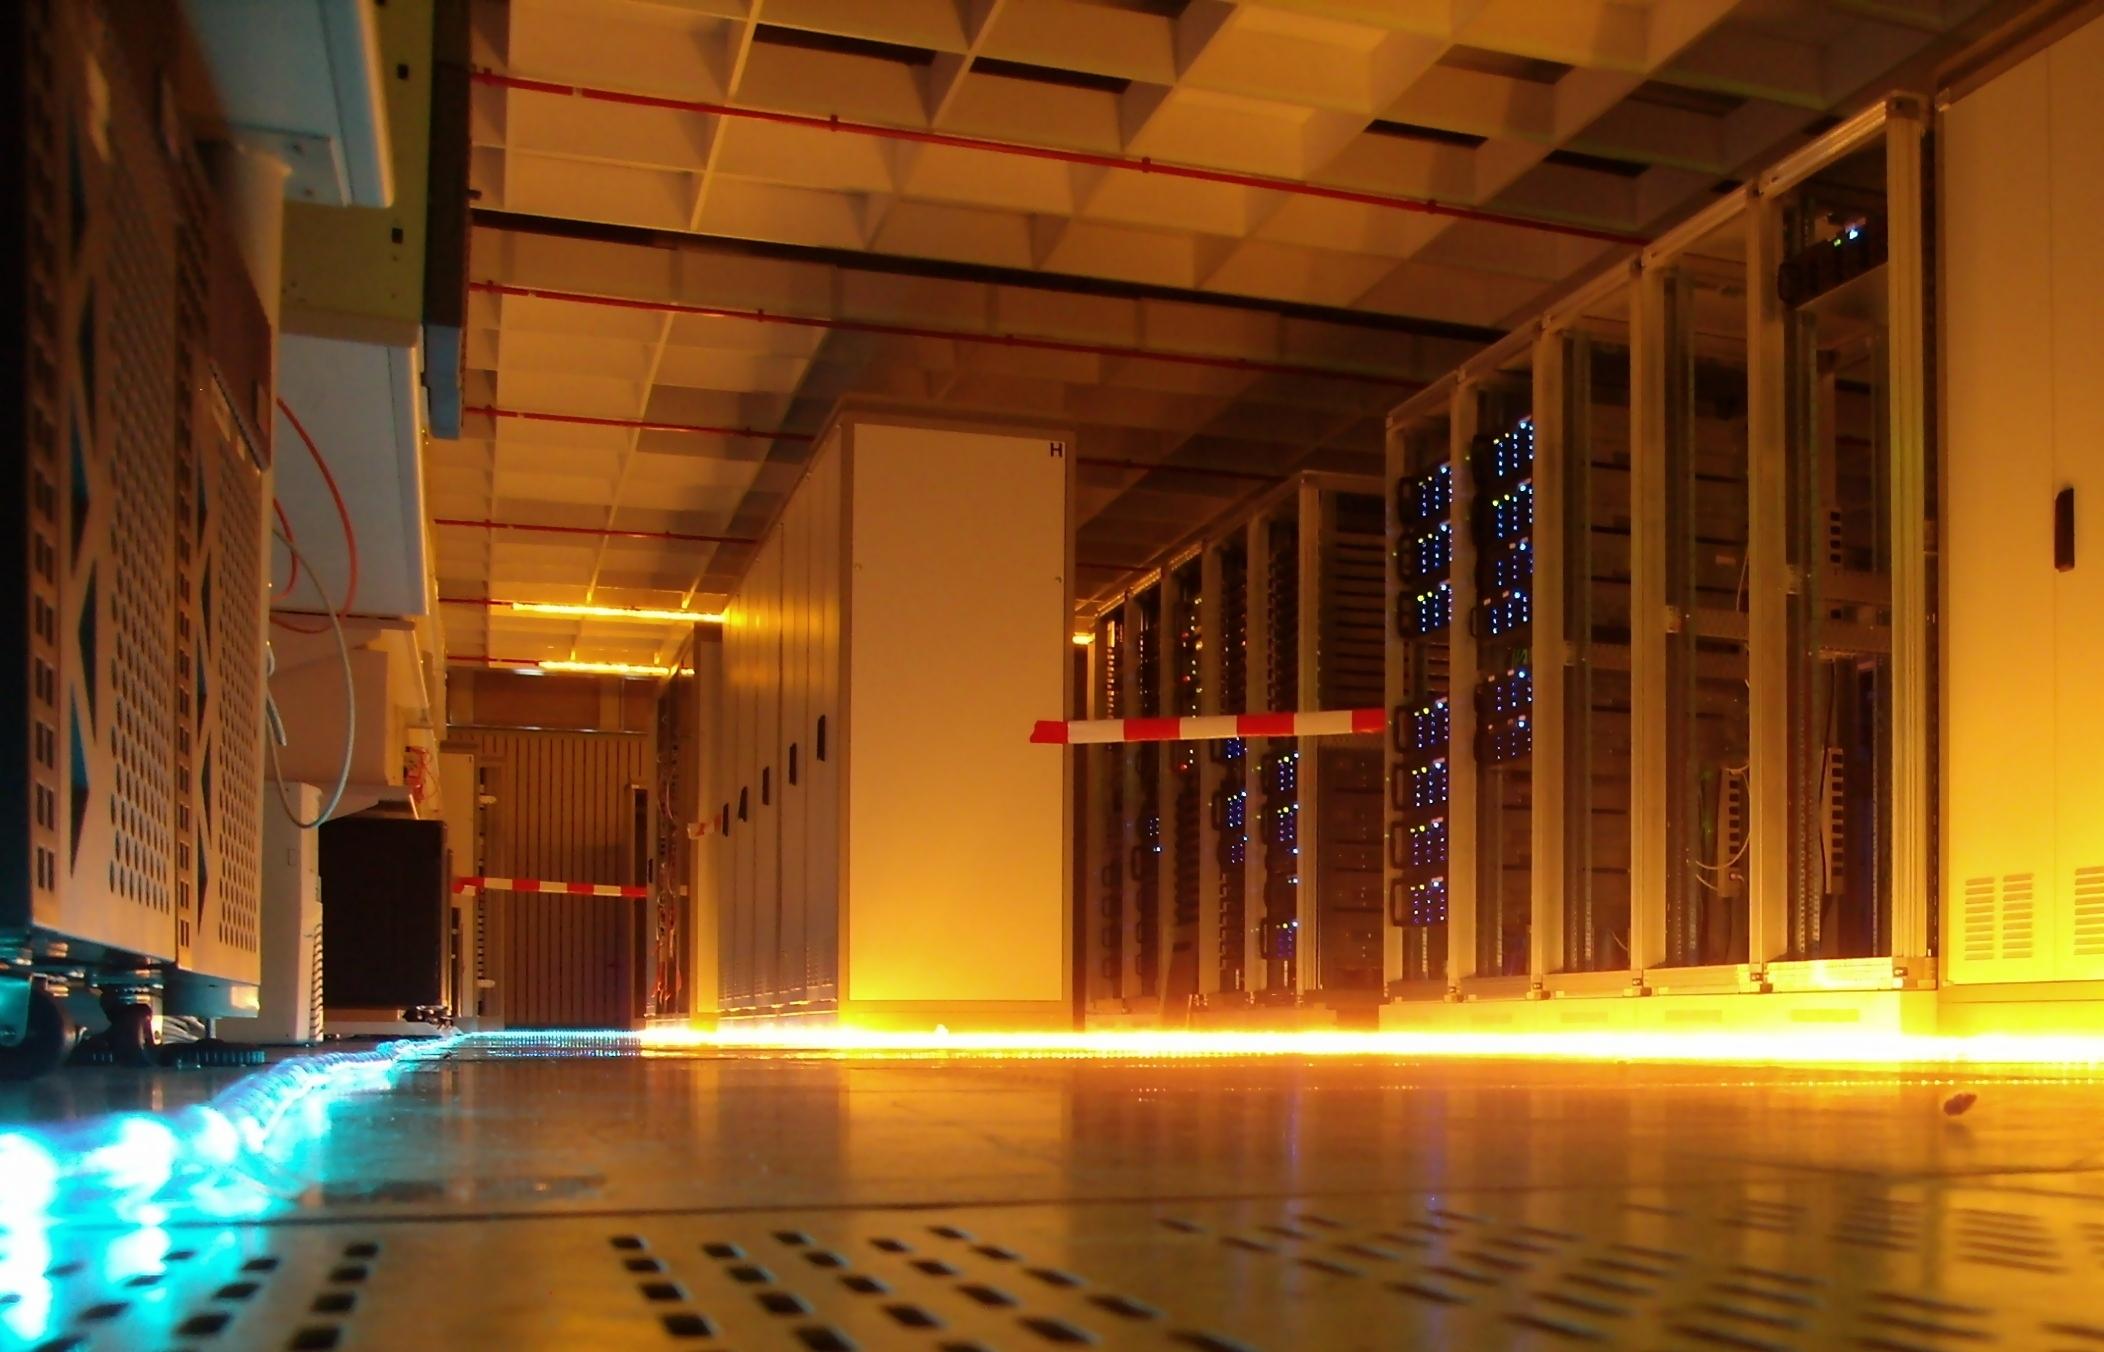 cpd servers